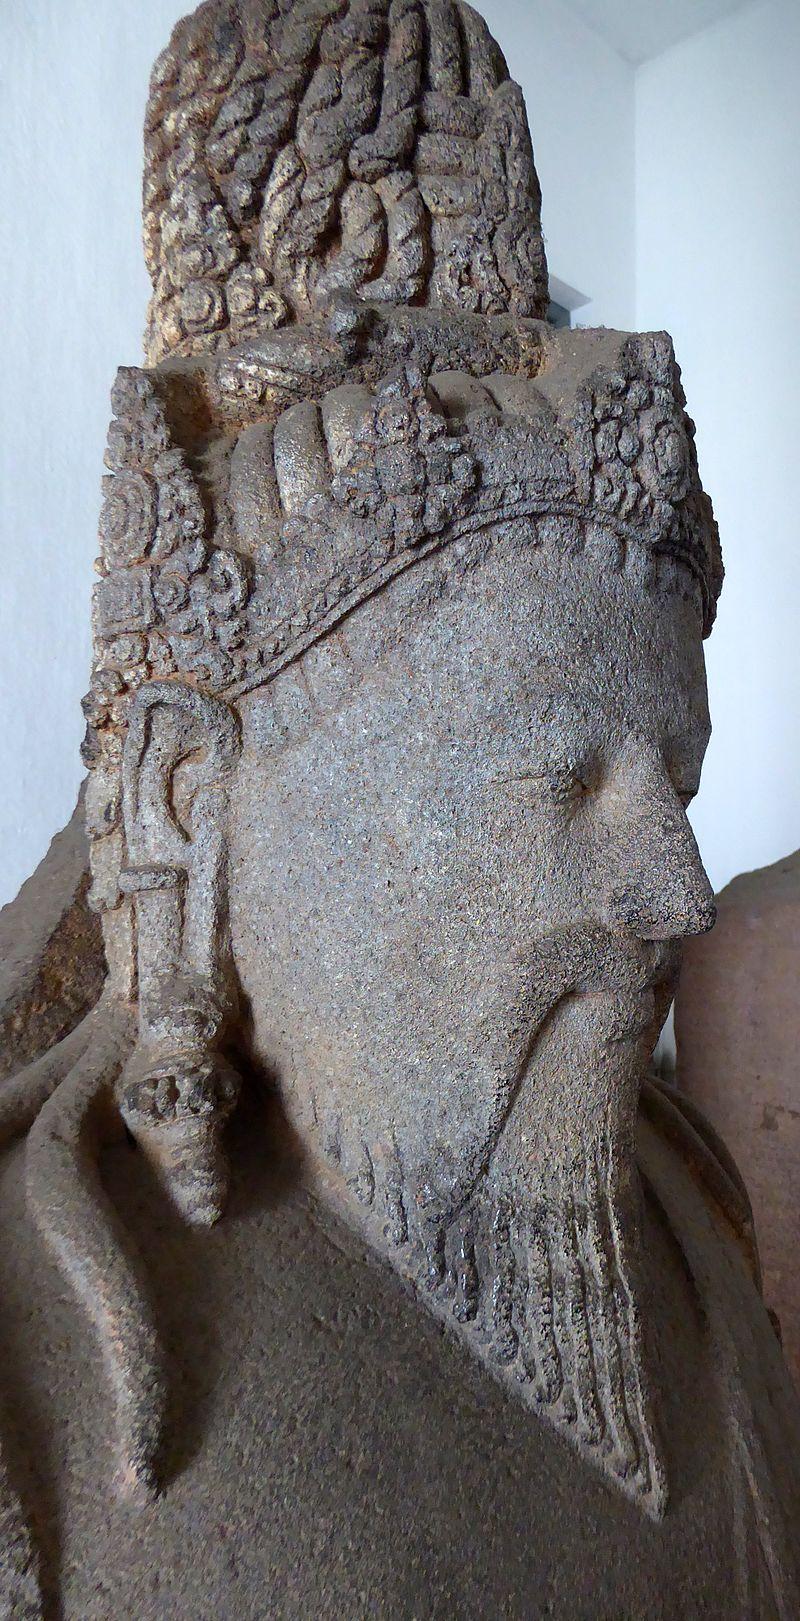 069 Siva Mahaguru Agastya, Cando Banon, Magelang, Central Java, 8-9th c (23122032859).jpg